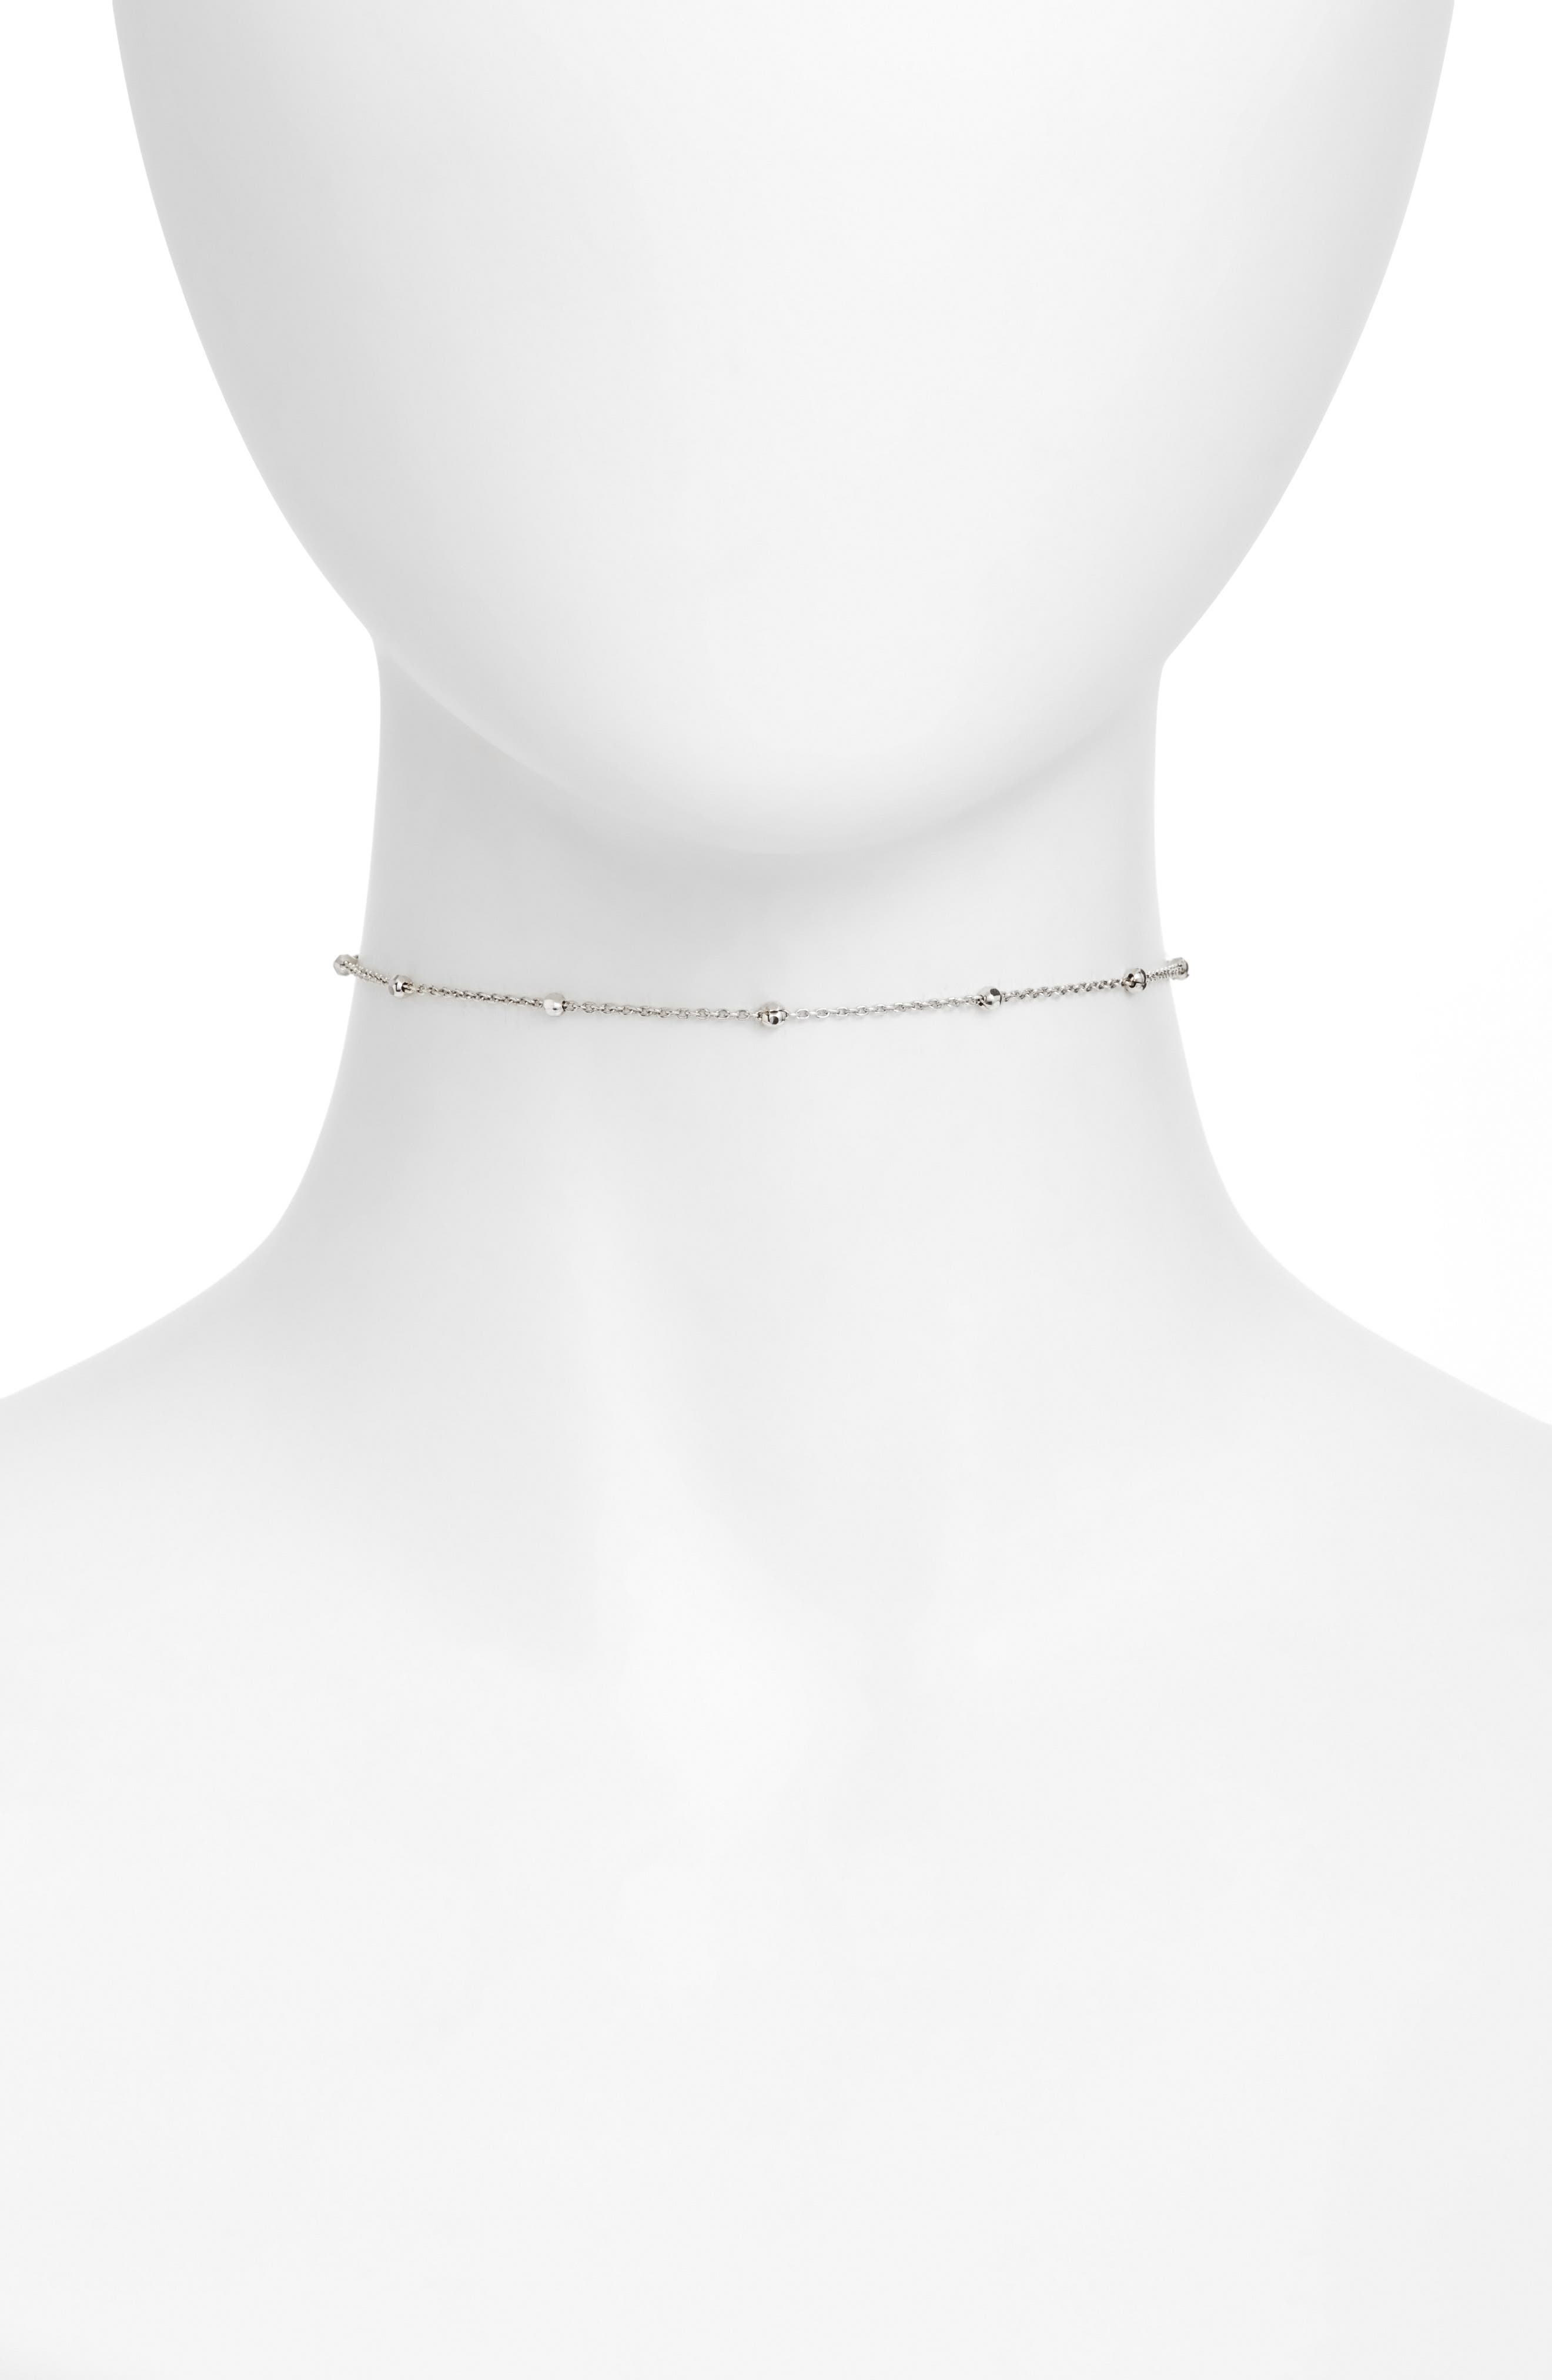 ARGENTO VIVO Choker Necklace